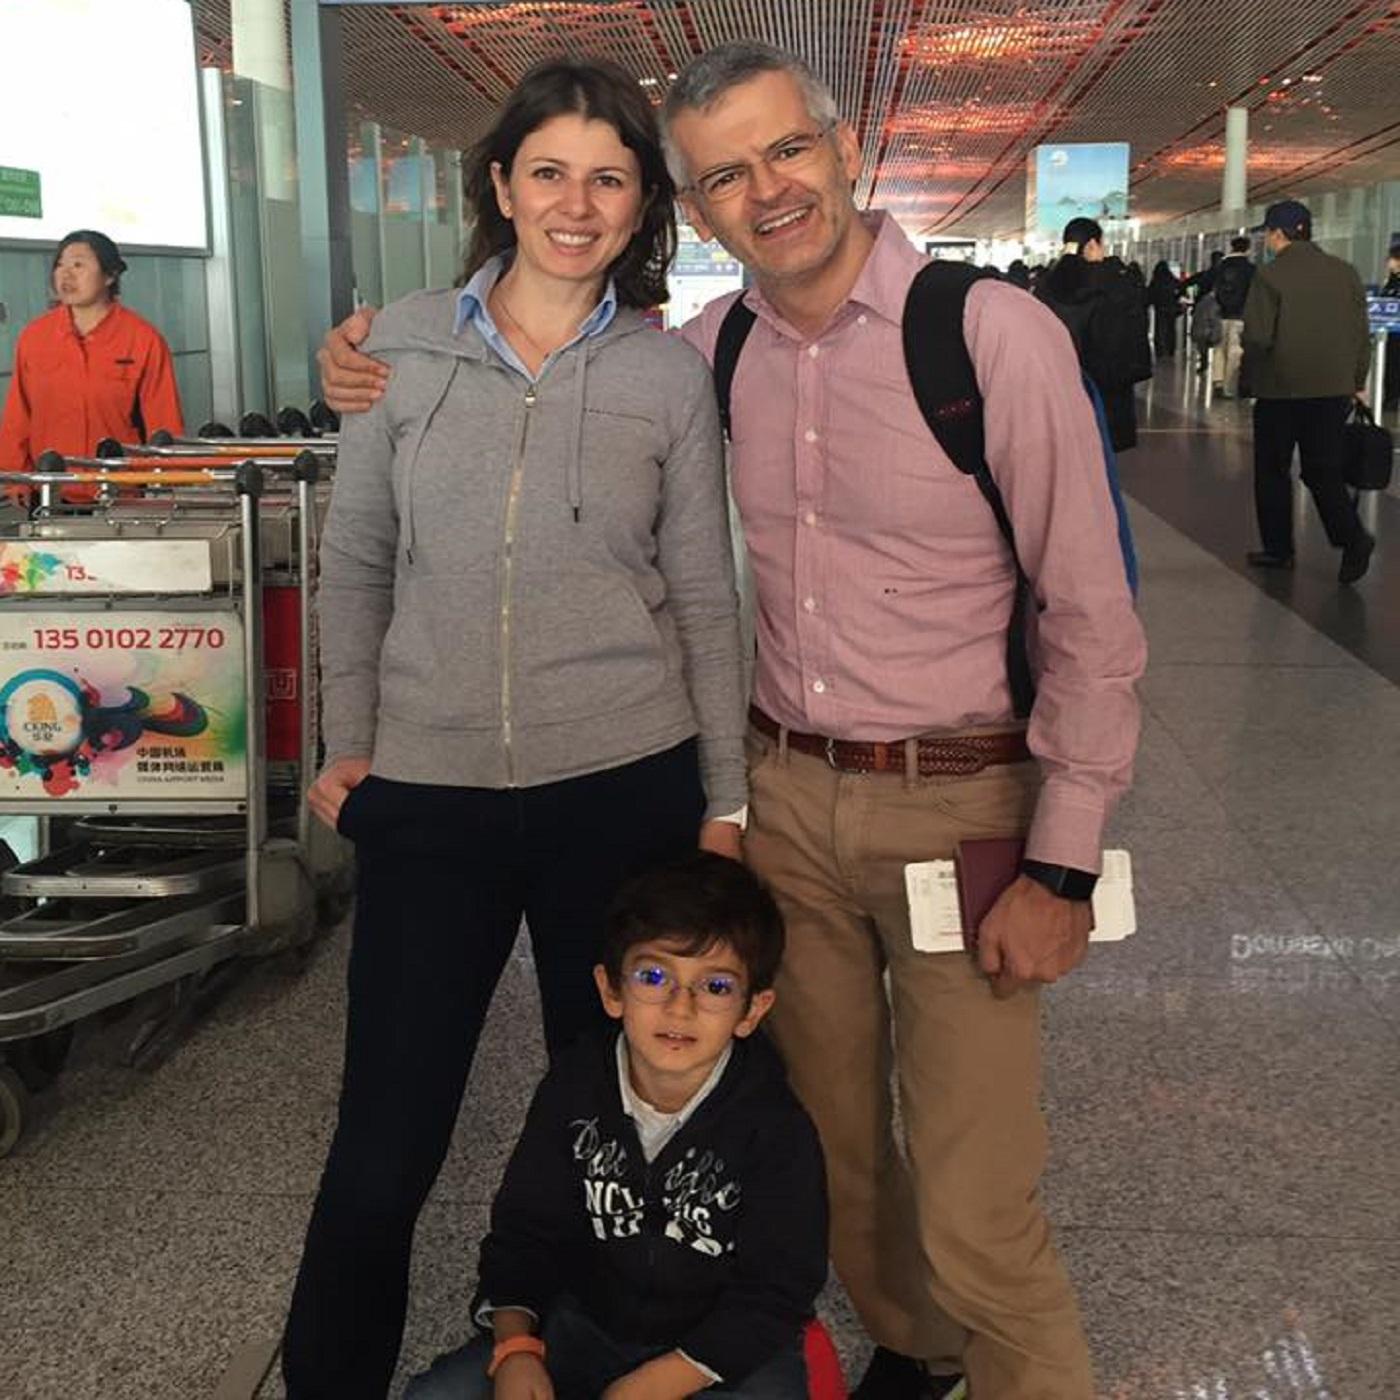 #2 WElcome to Armenia: the Armenian adventures of the Italian family